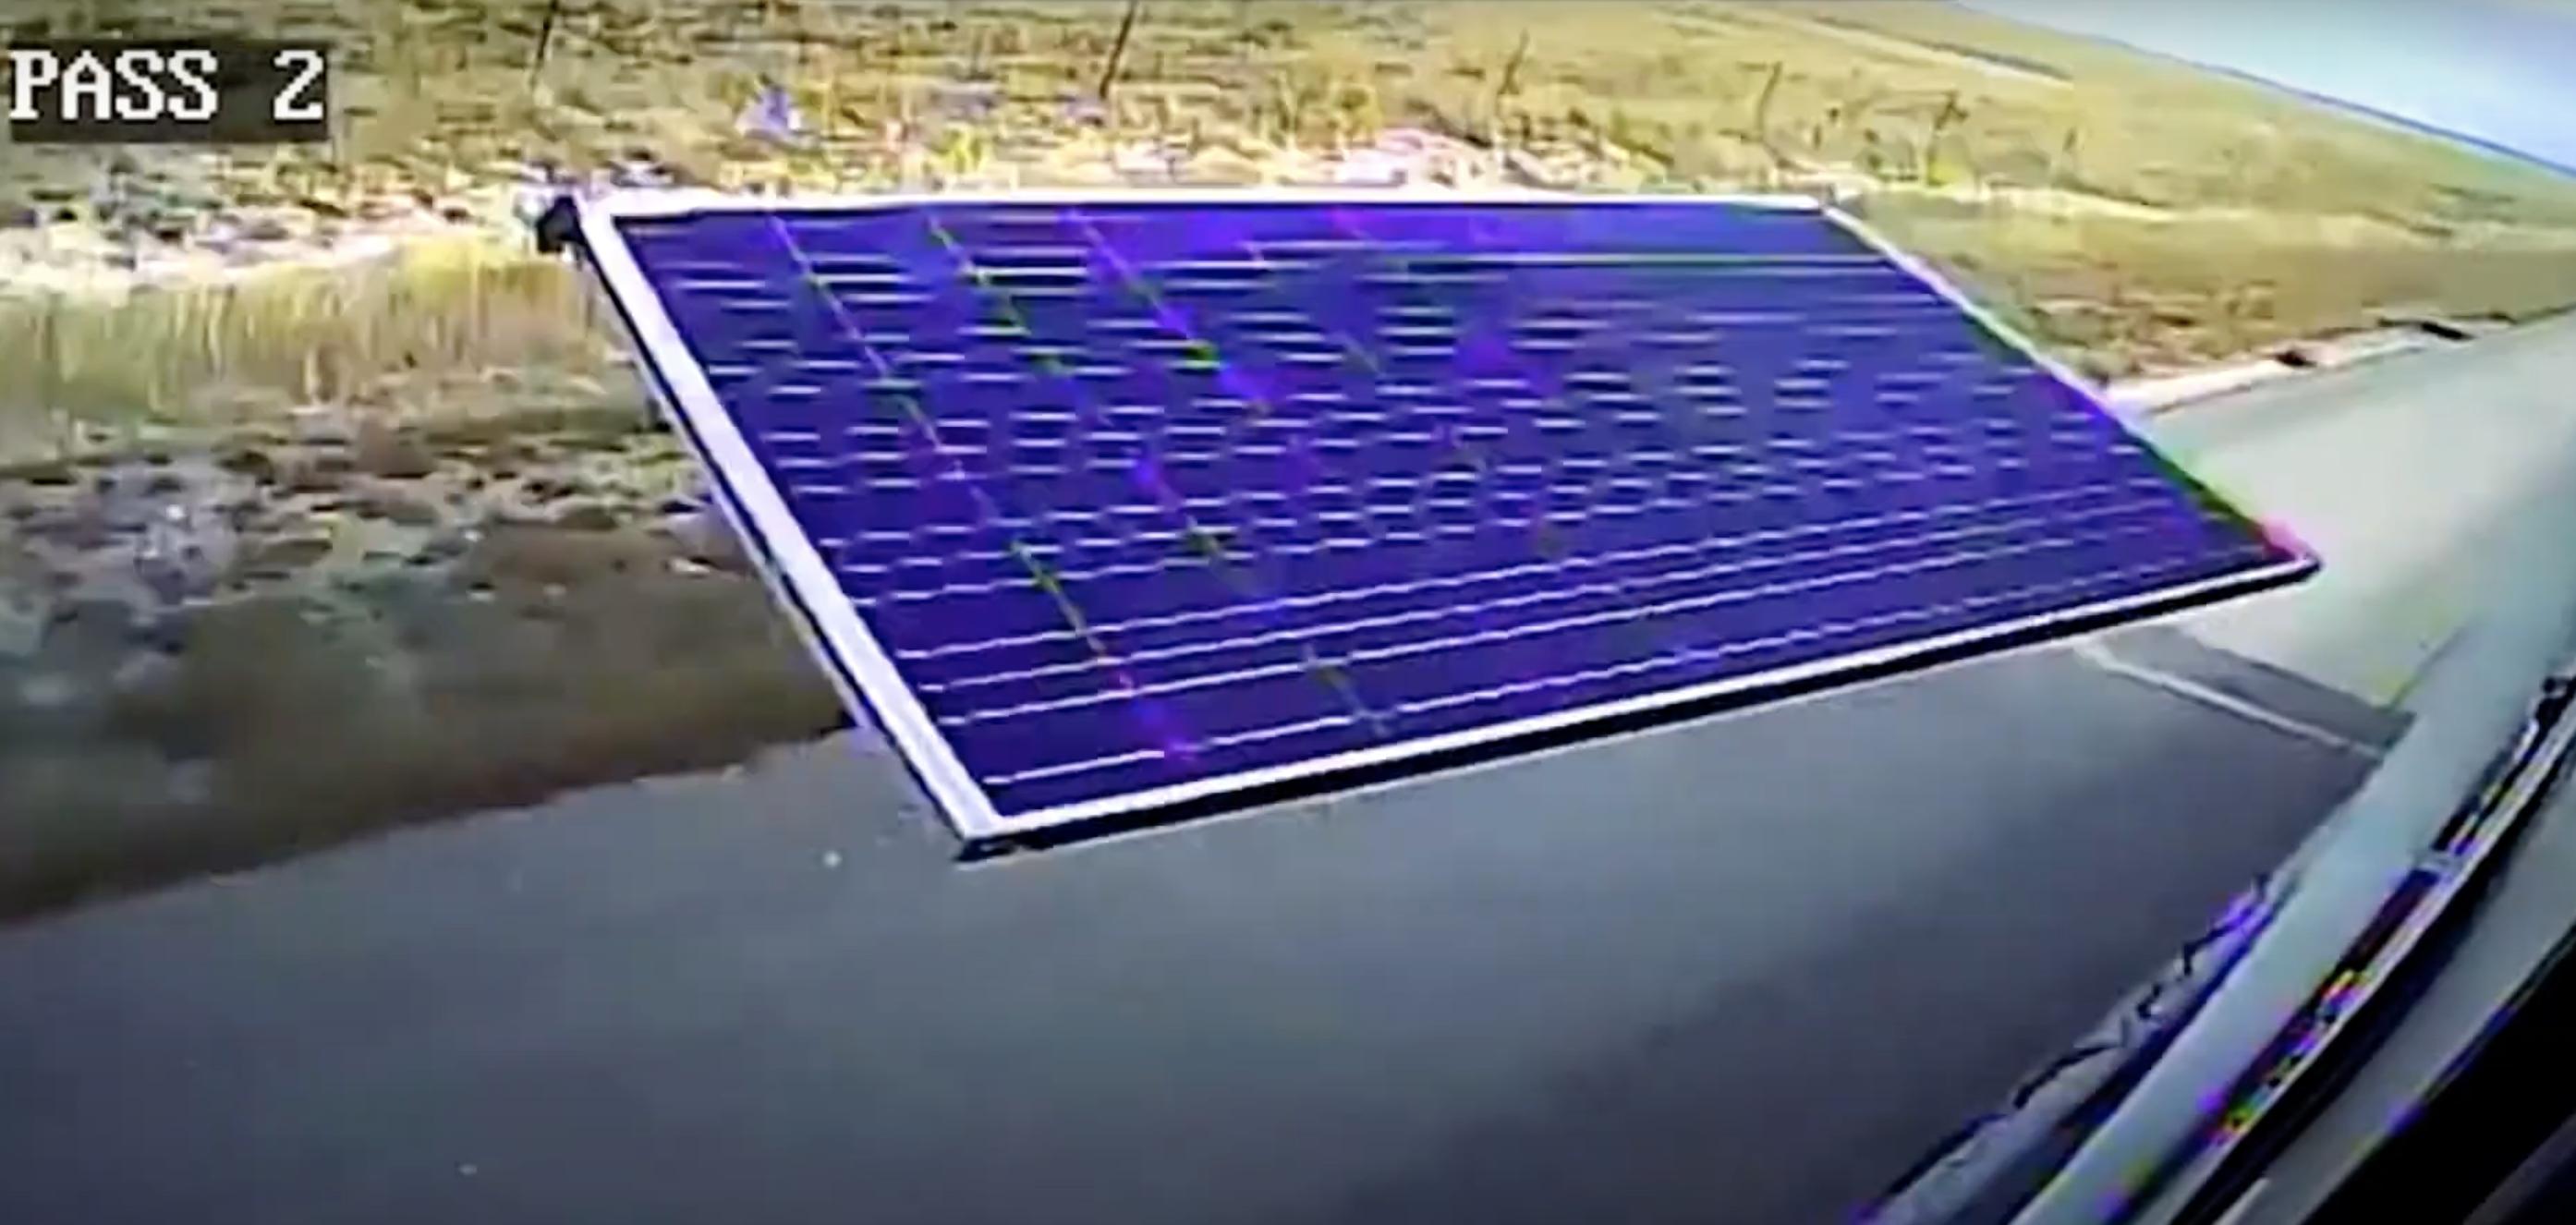 flying solar panels - not a good sight